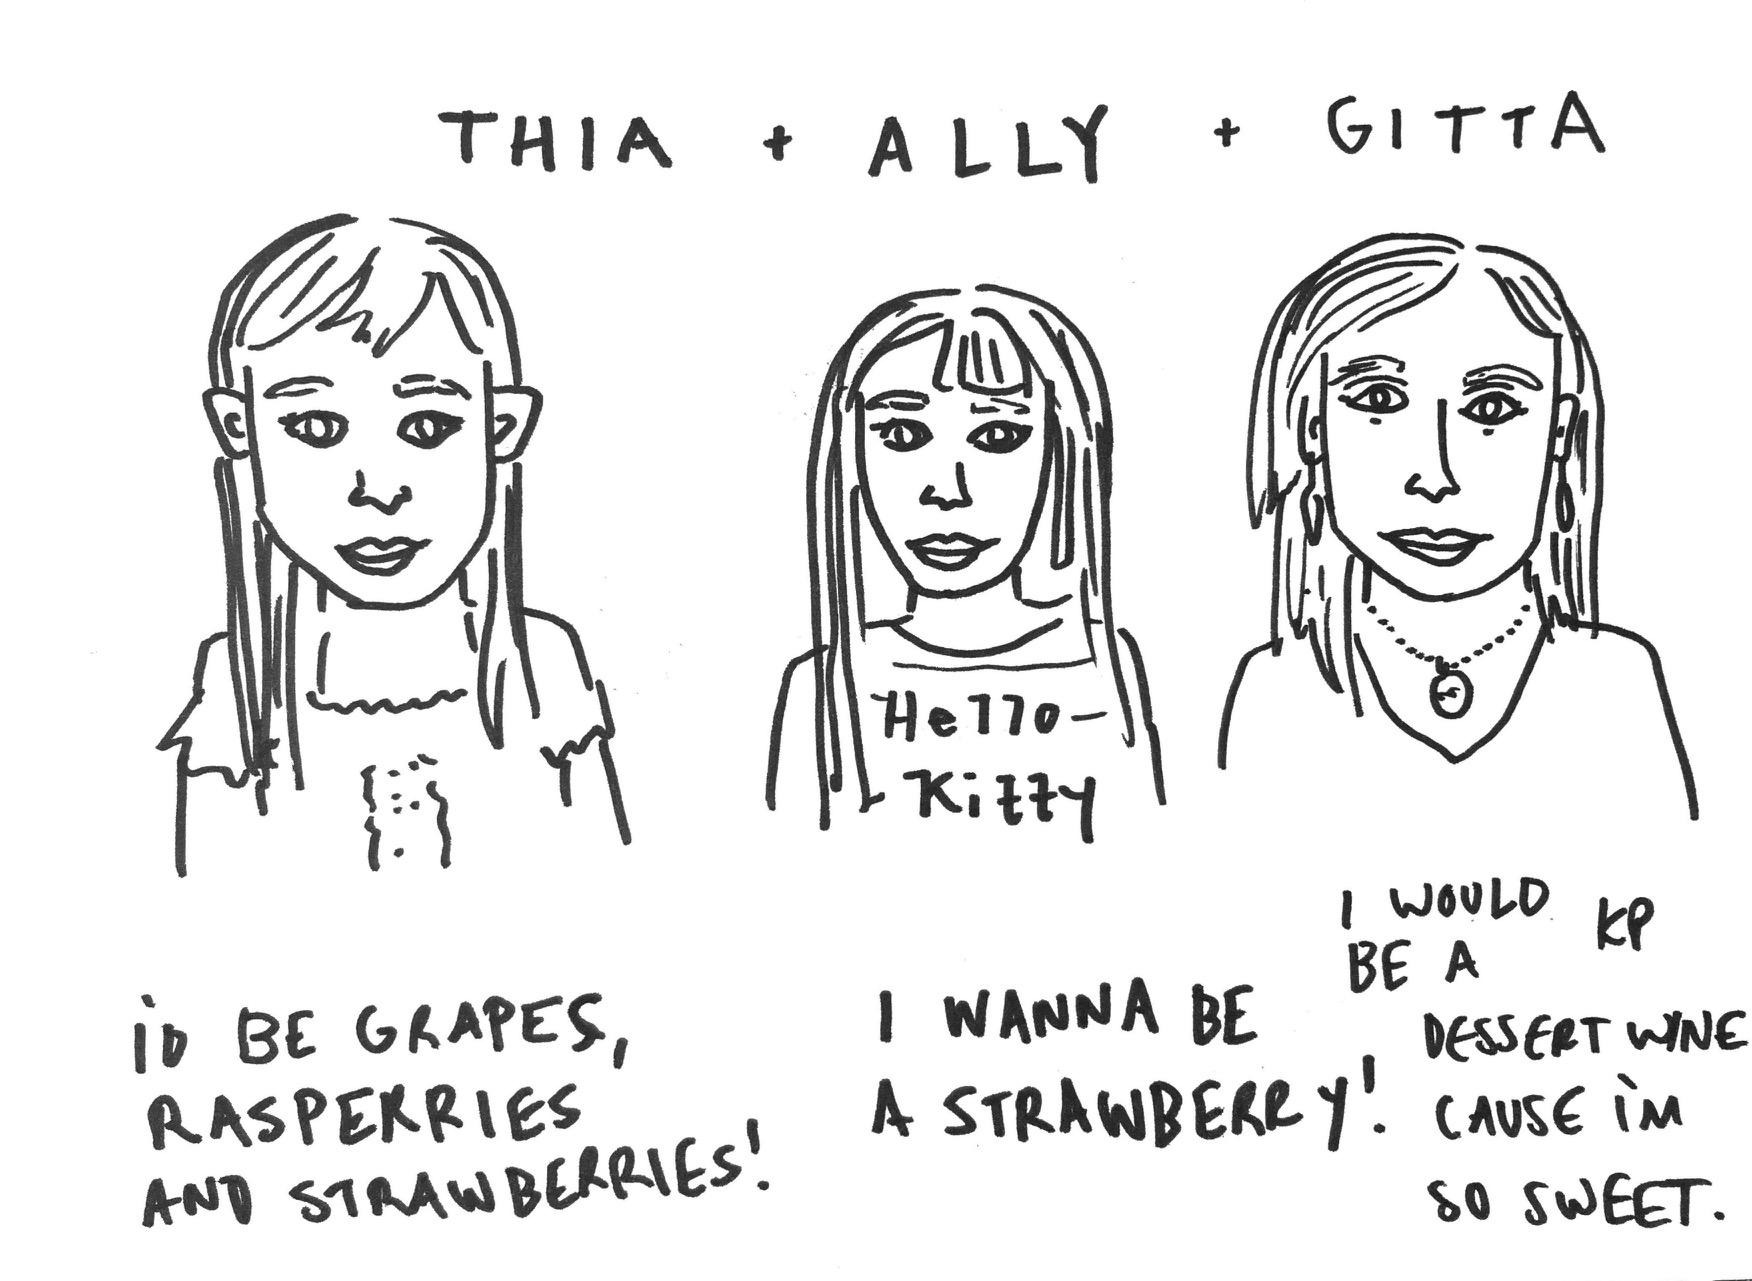 Thia + Ally + Gitta.jpg